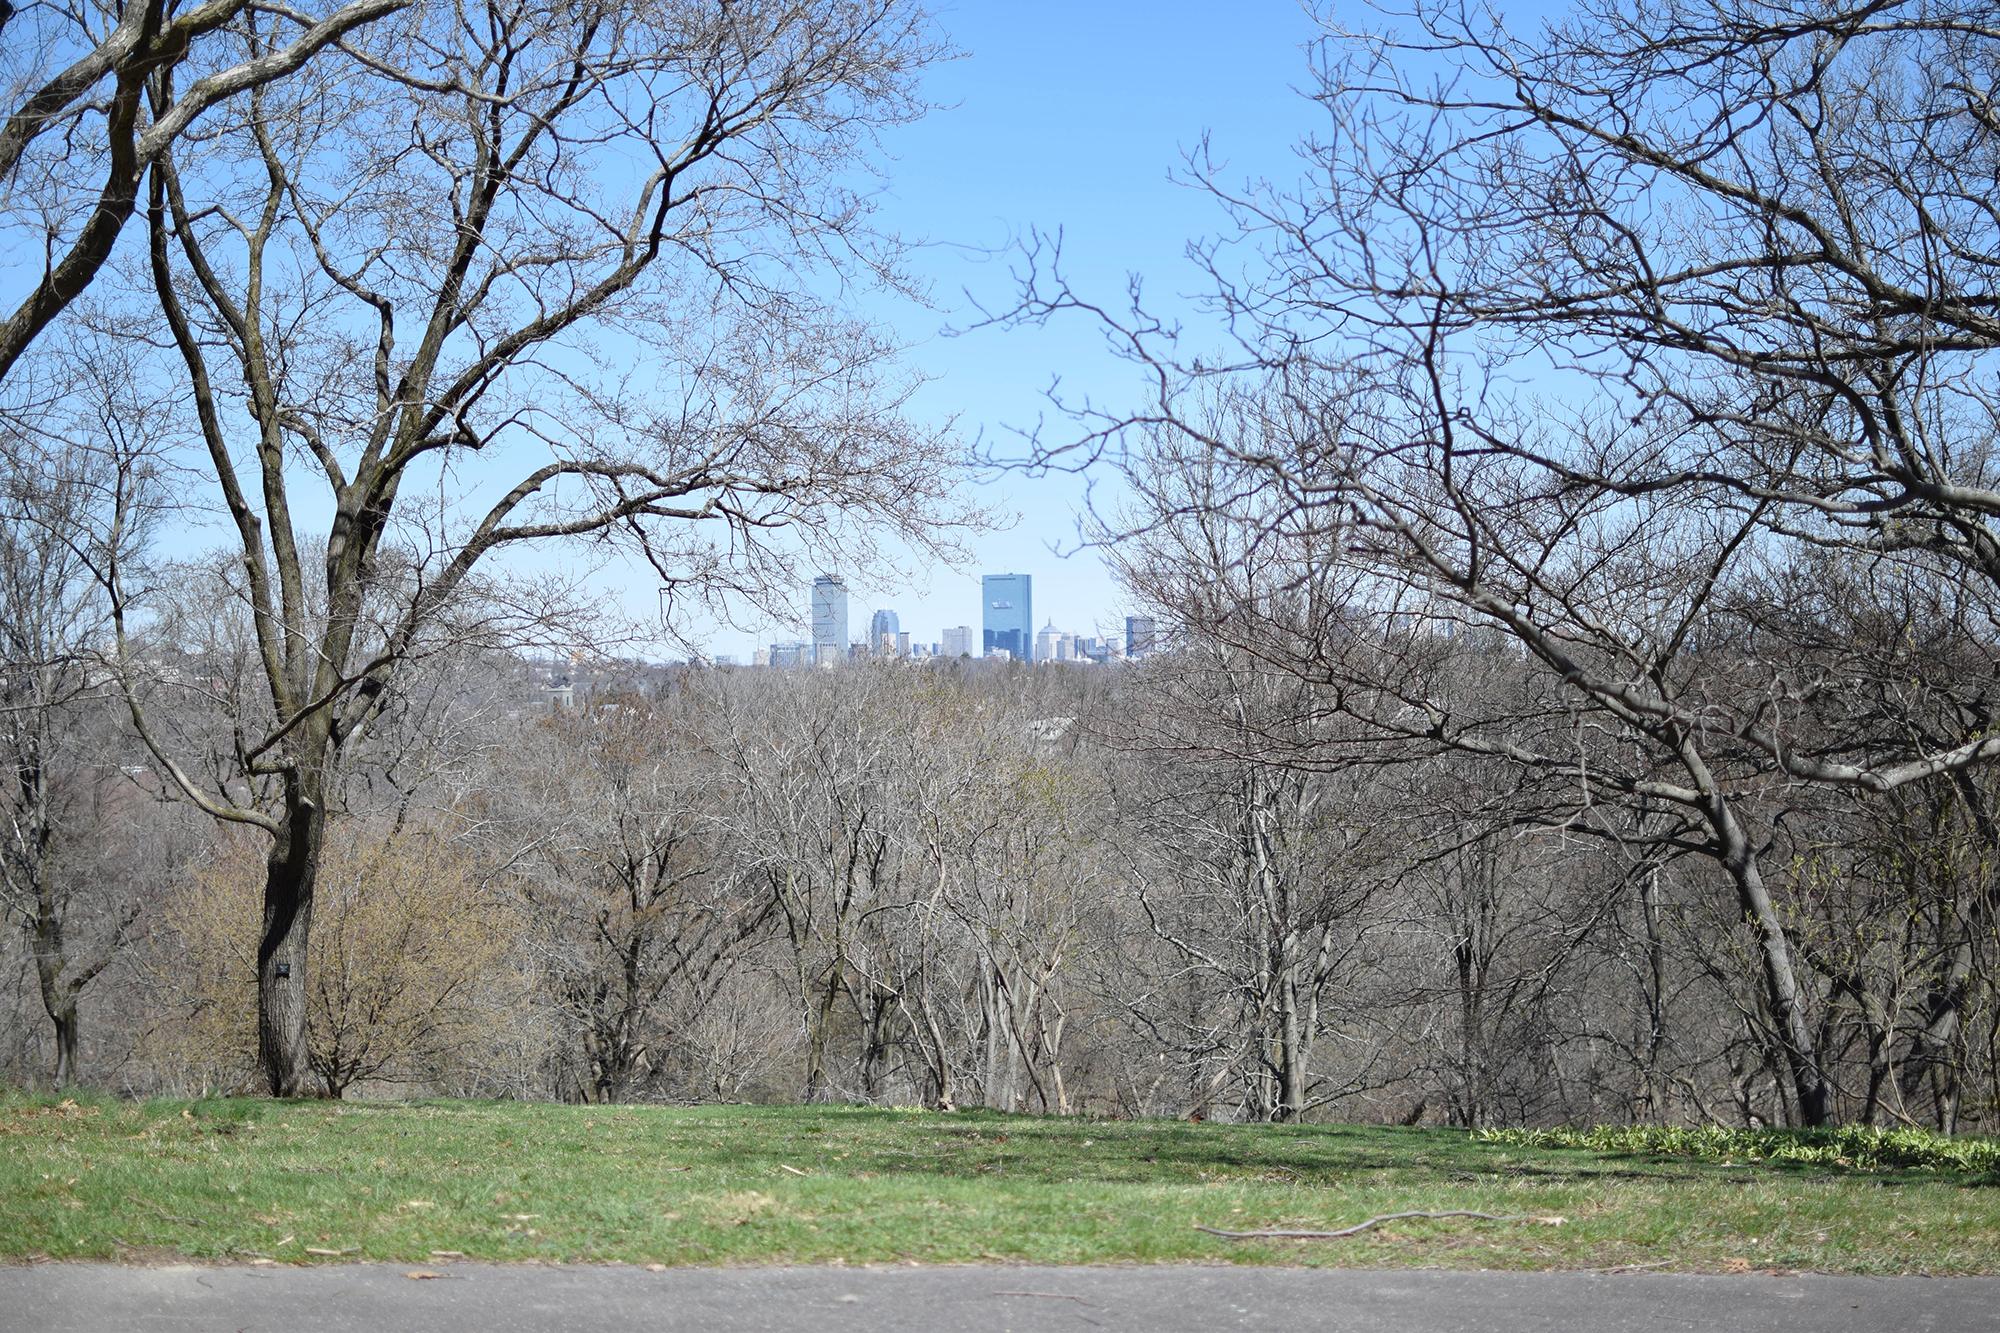 Arnold Arboretum - 8 Fun Things to Do in Boston - FilterGrade